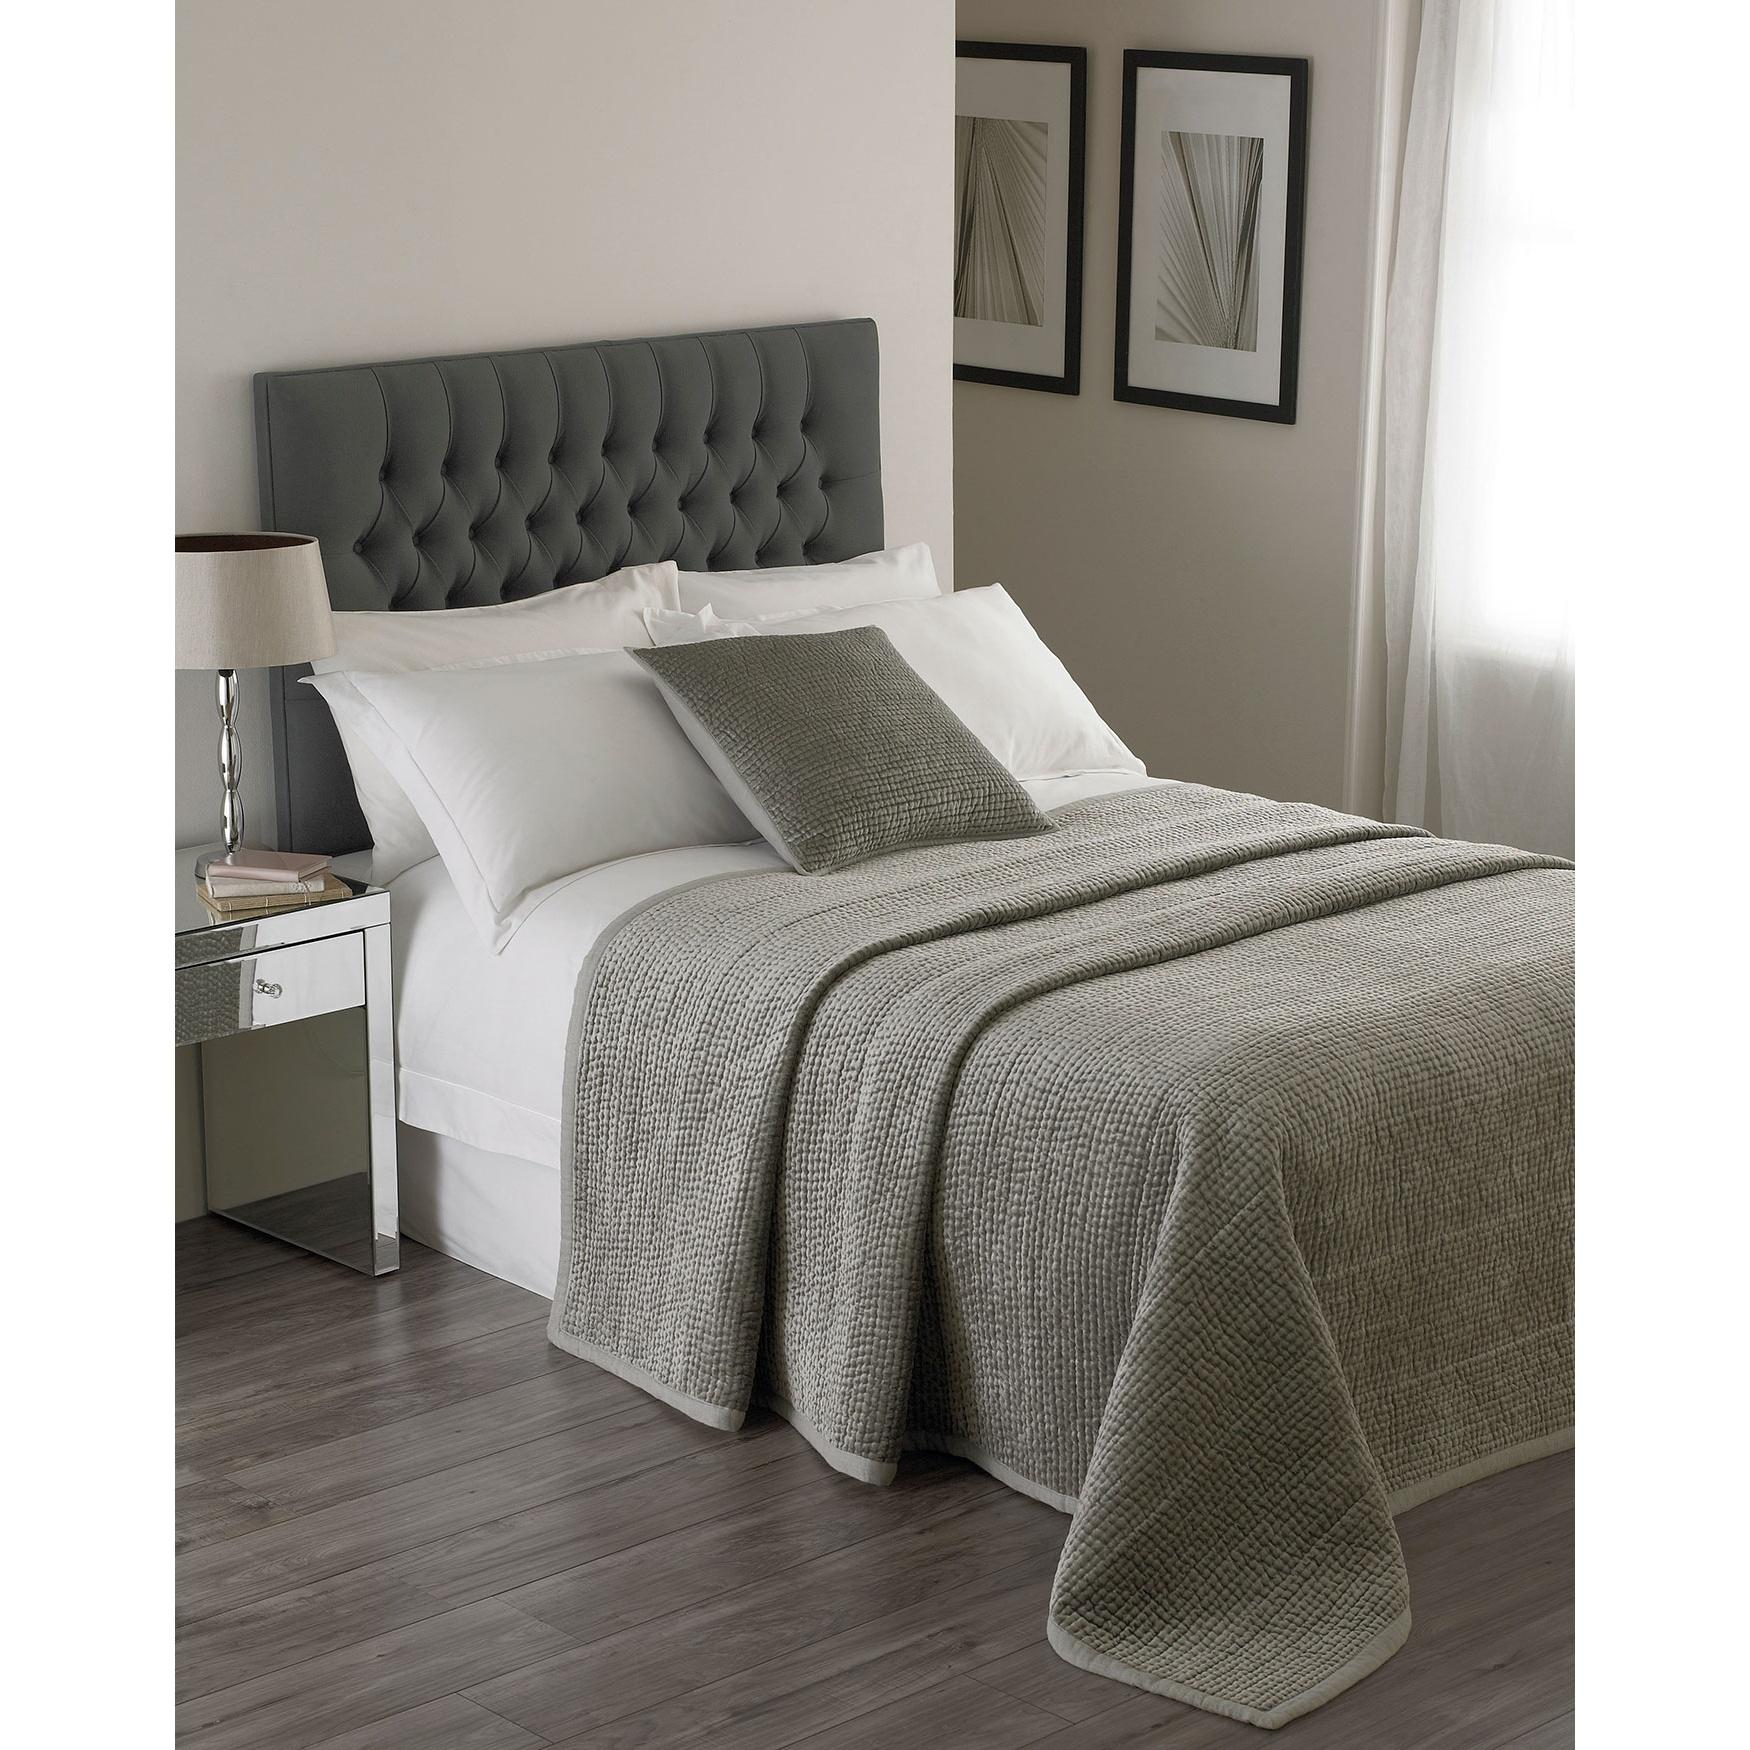 Riva Home Brooklands Bedspread (265x265cm) (Silver)